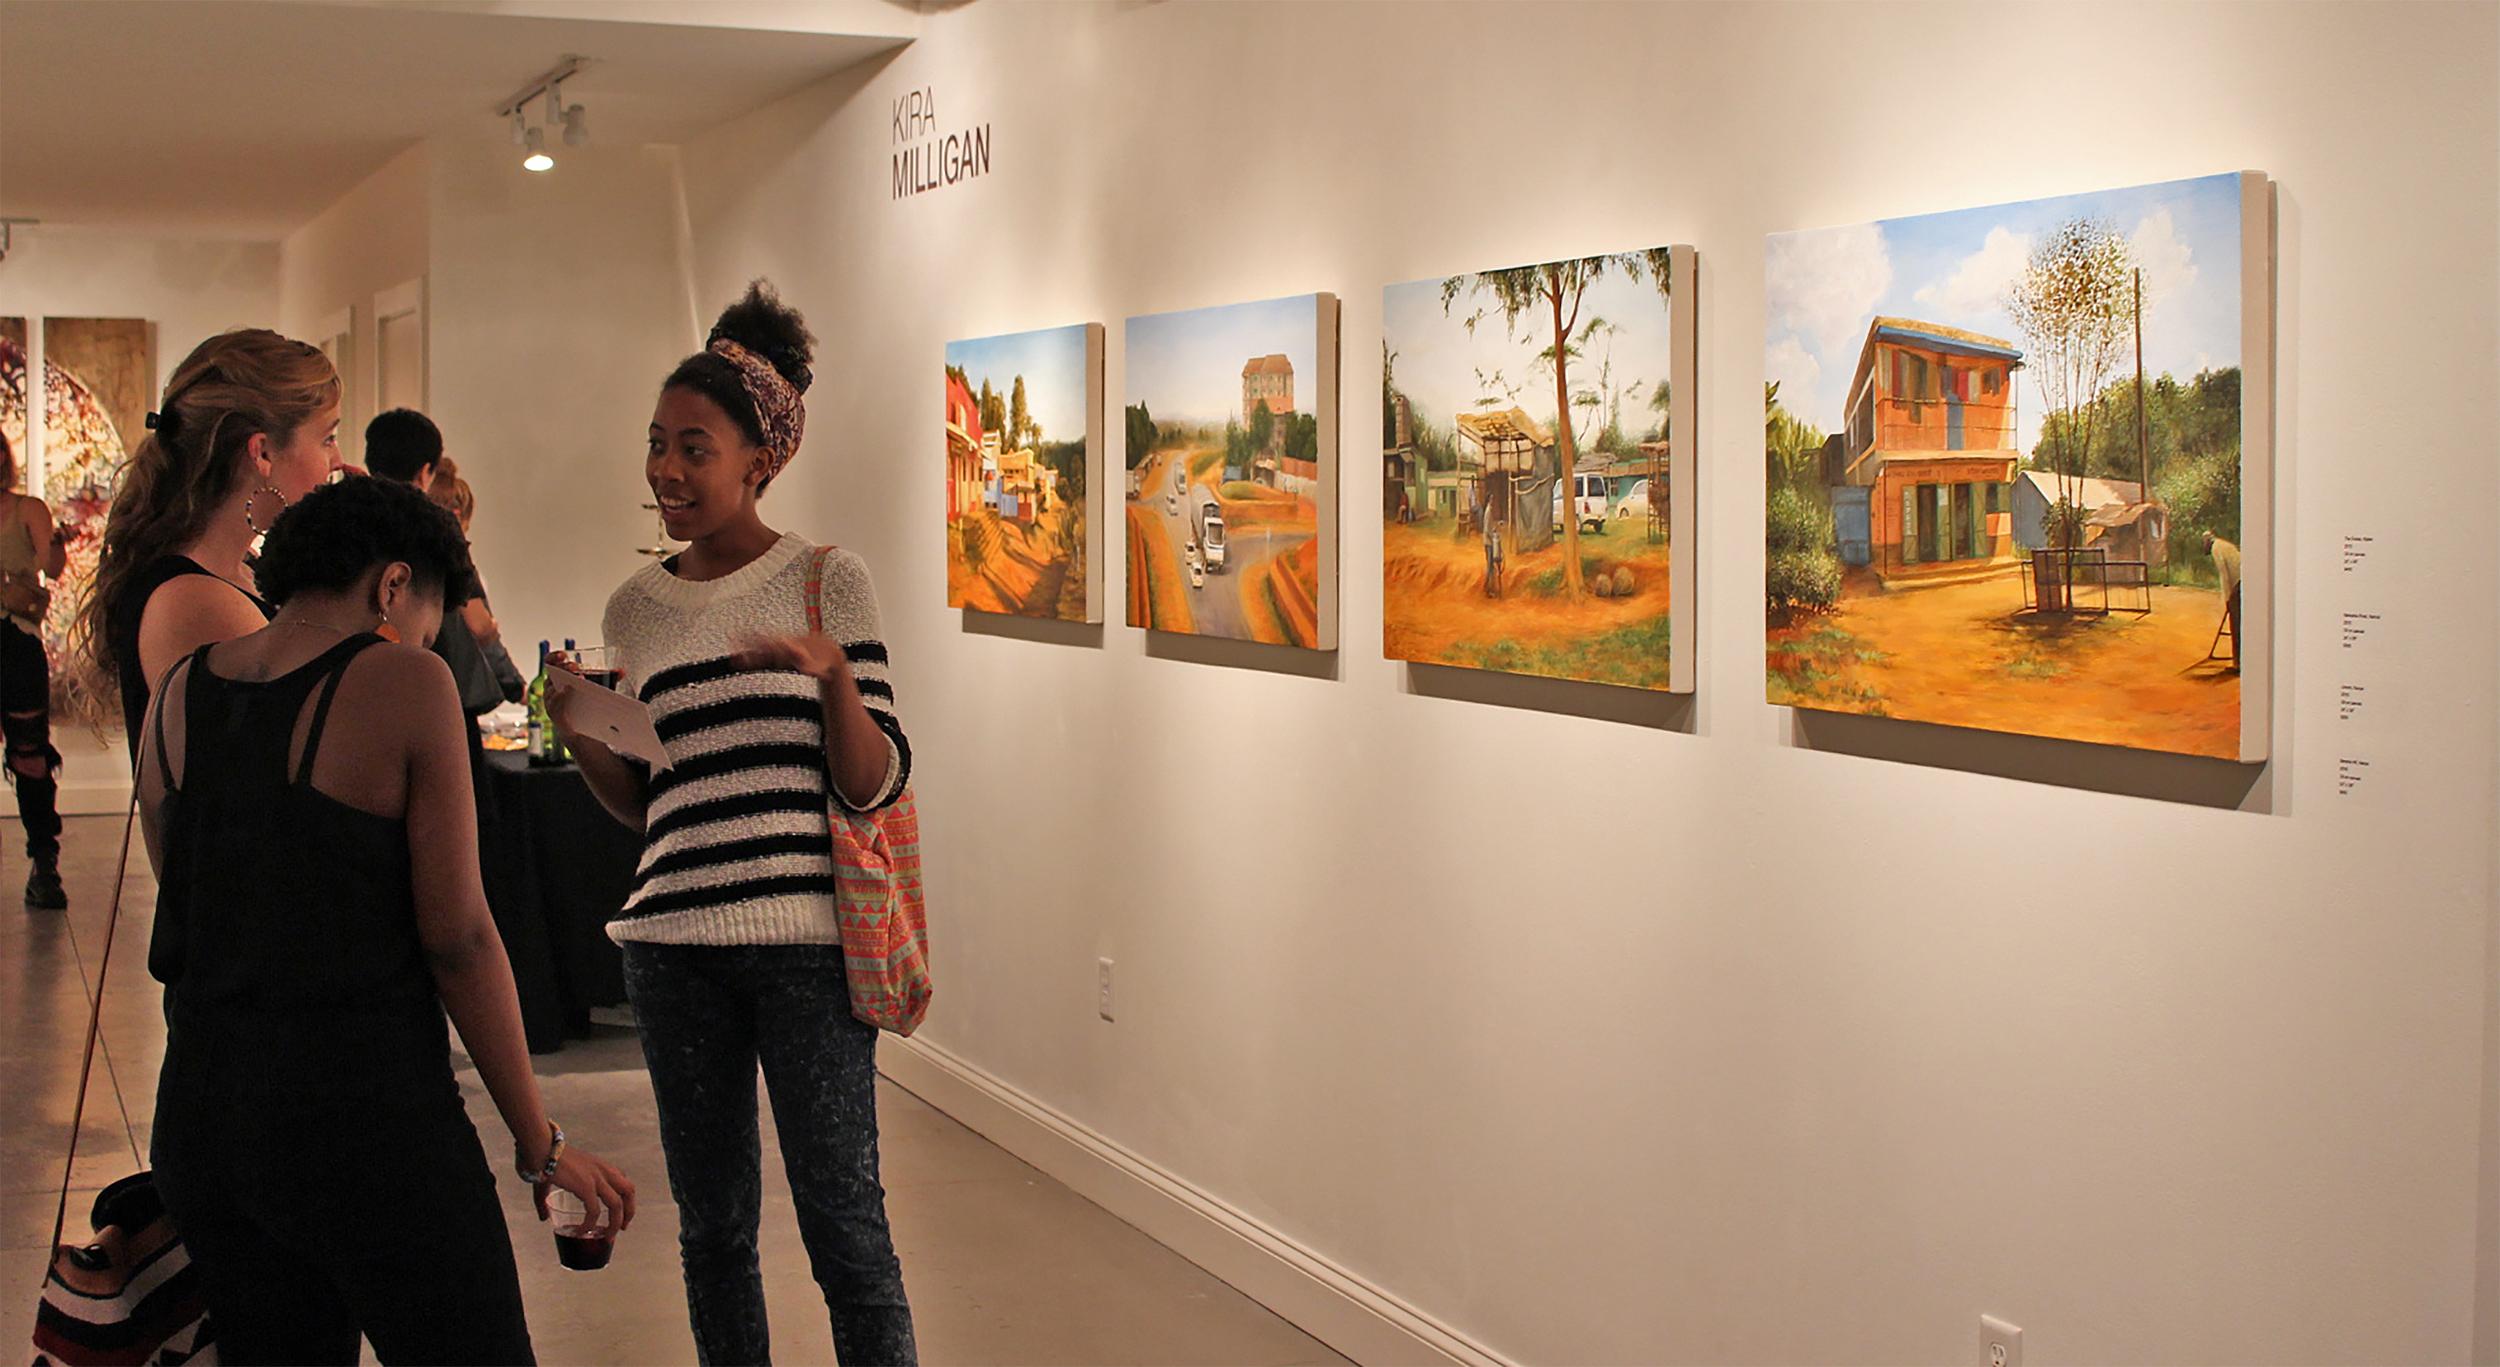 Kira Milligan's series installed at the Oglethorpe Gallery, INHABIT, 2016